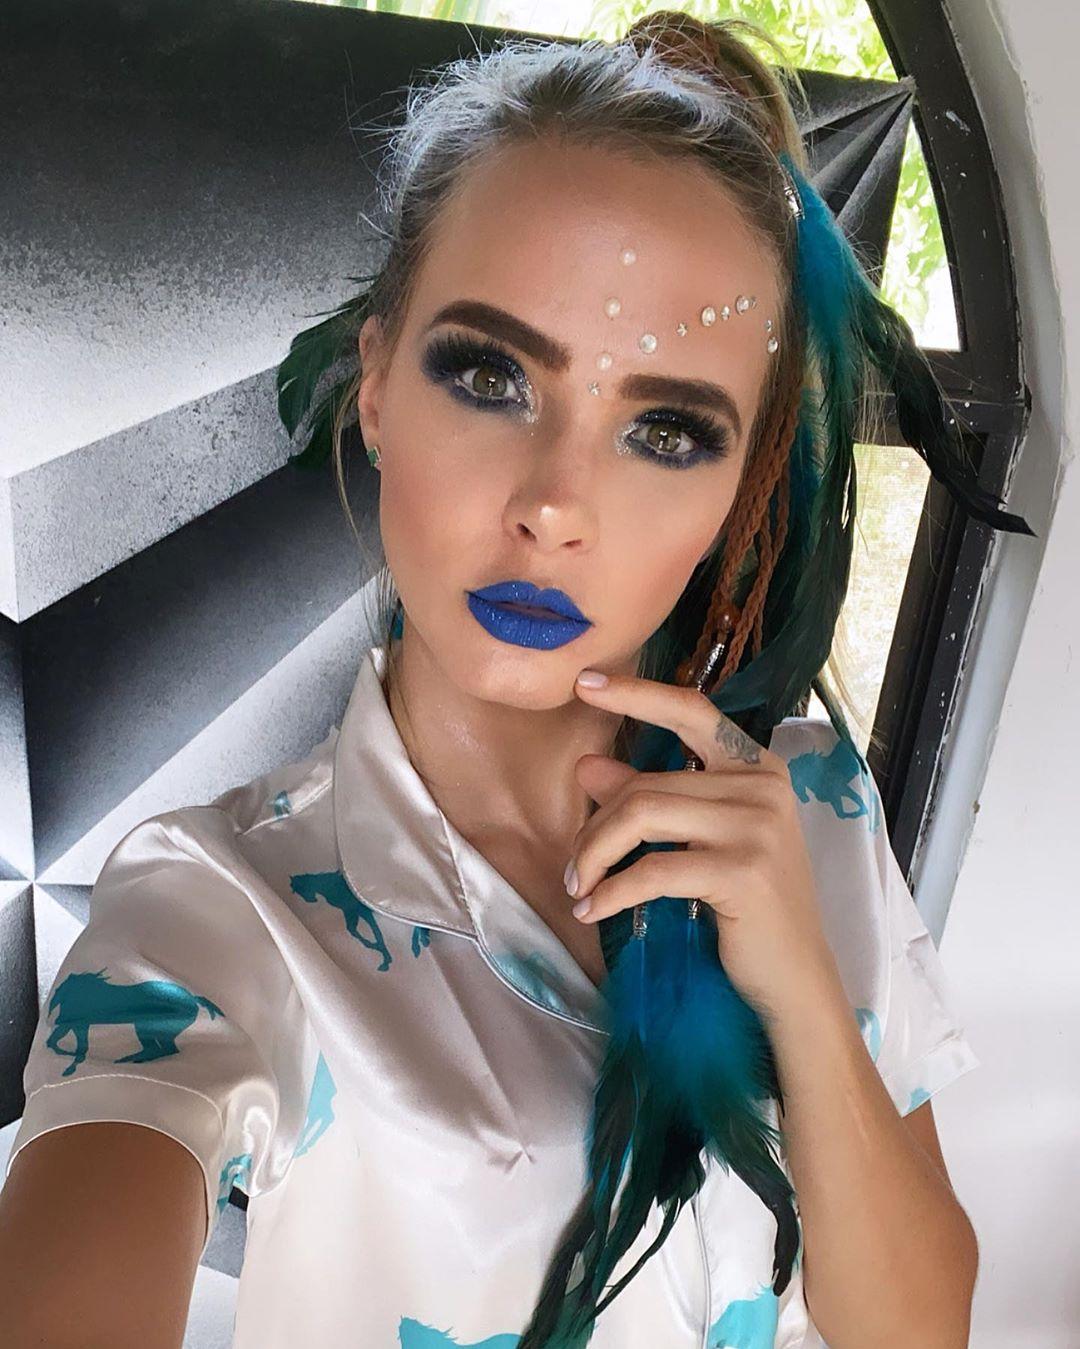 Elizabeth-Loaiza-Junca-Wallpapers-Insta-Fit-Bio-5